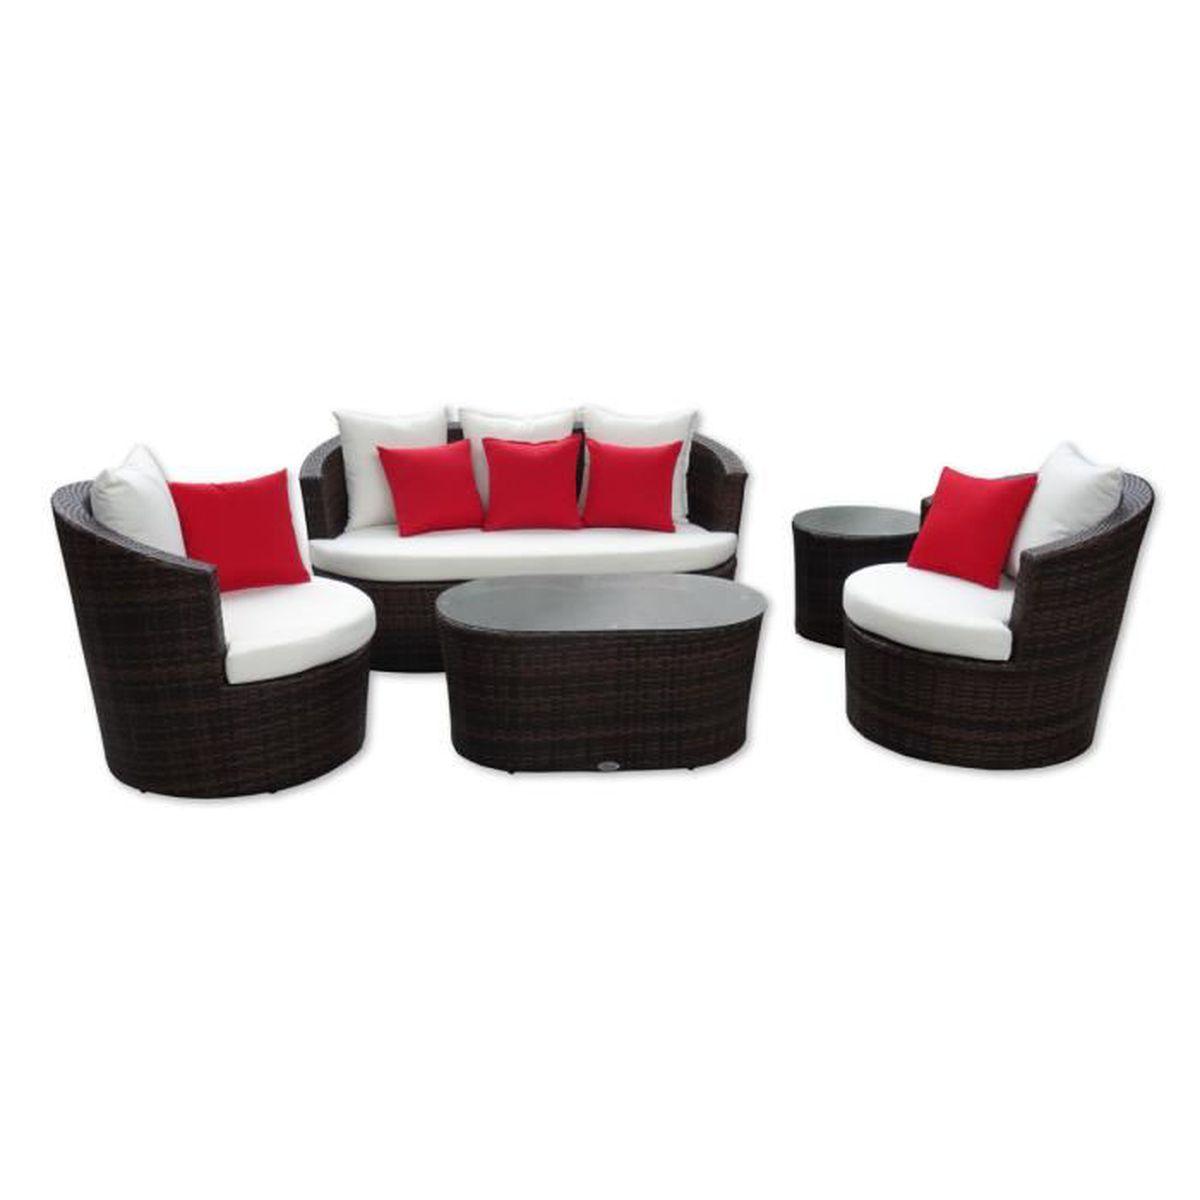 Salon de jardin poly rotin tressé - Ensemble meubles rond ...